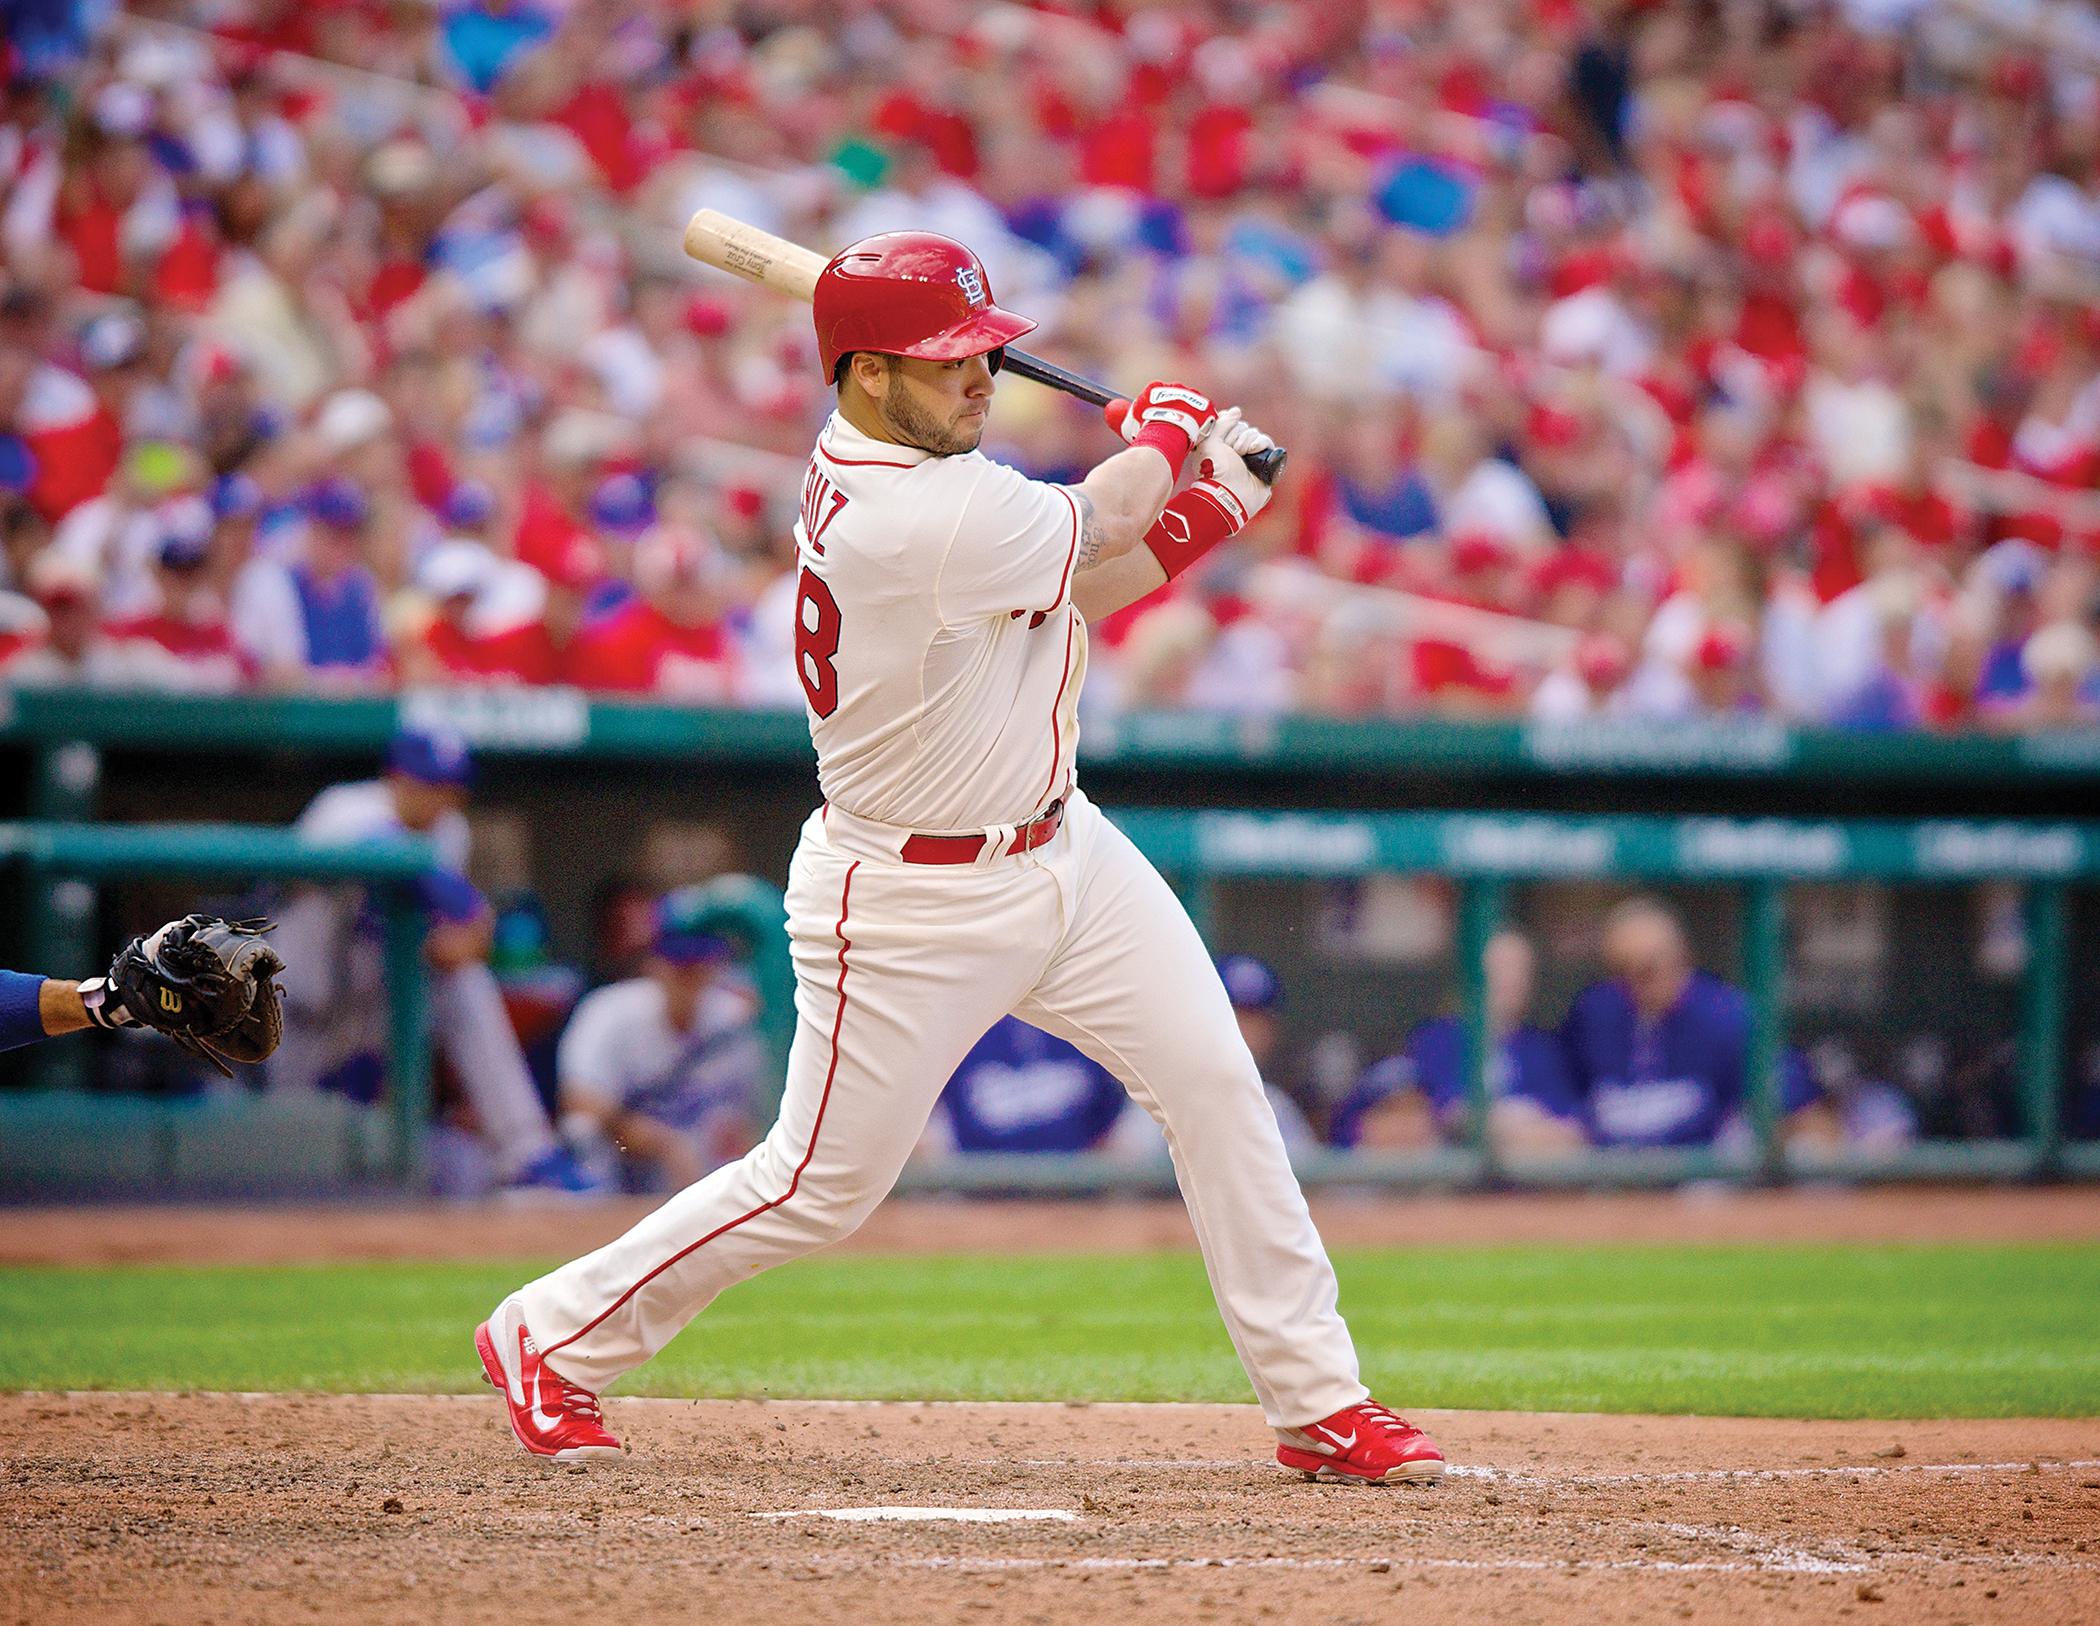 Tony Cruz at bat